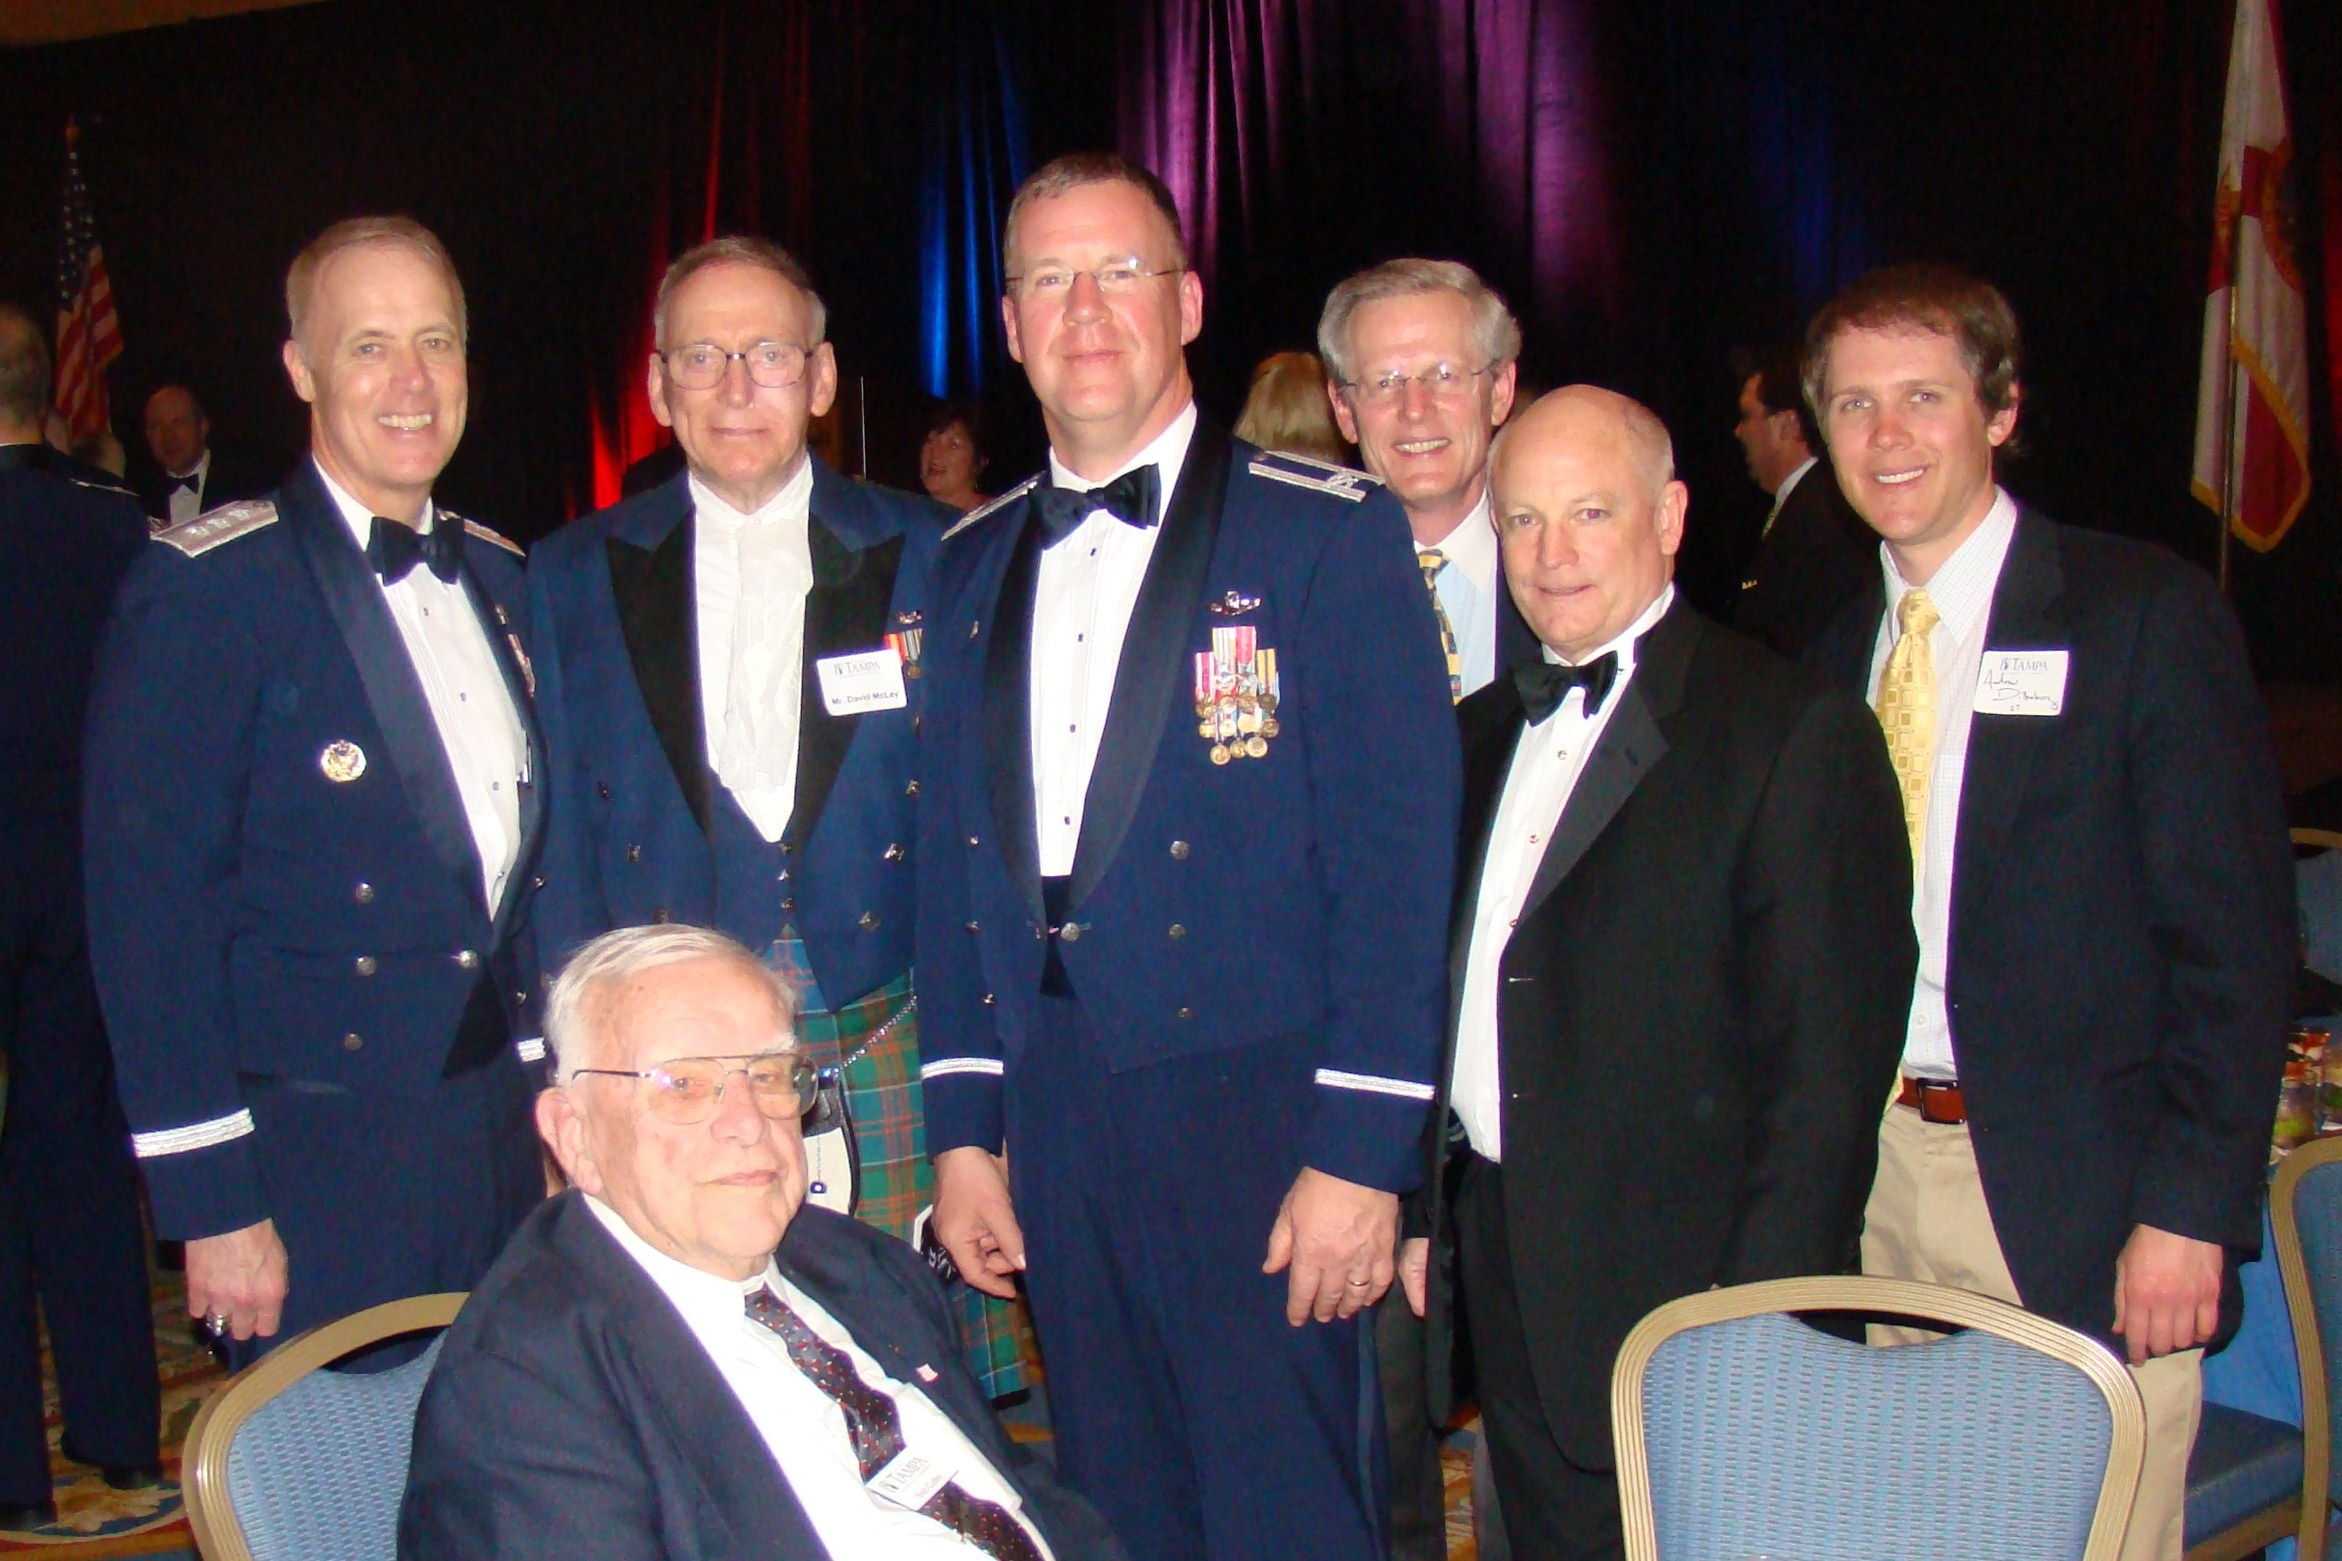 Dick, David McLay, Larry Martin, Steve Dillengurg, Ned Hance, & Andrew D. with Bob Cutler - 1, 16 Feb '10.JPG